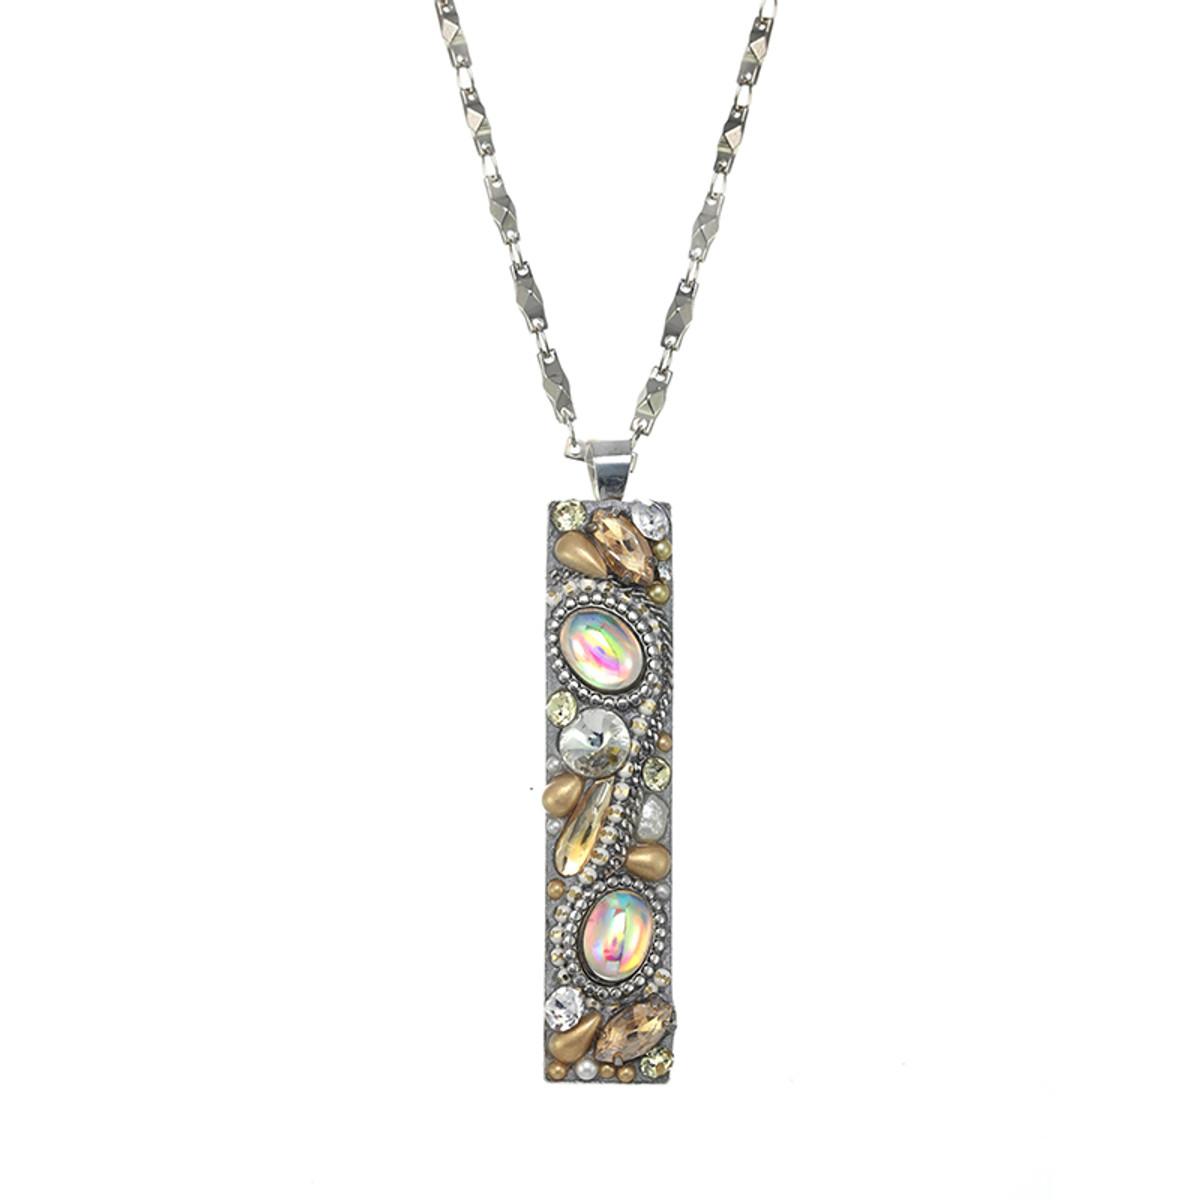 Michal Golan Moonlight Long Bar Necklace